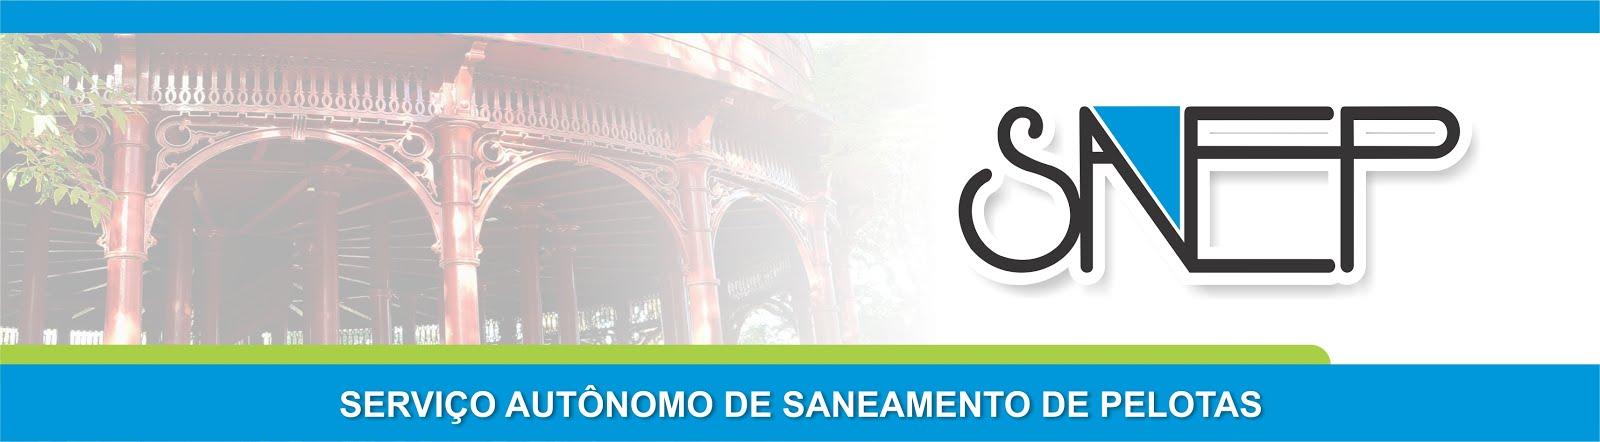 http://www.pelotas.rs.gov.br/sanep/